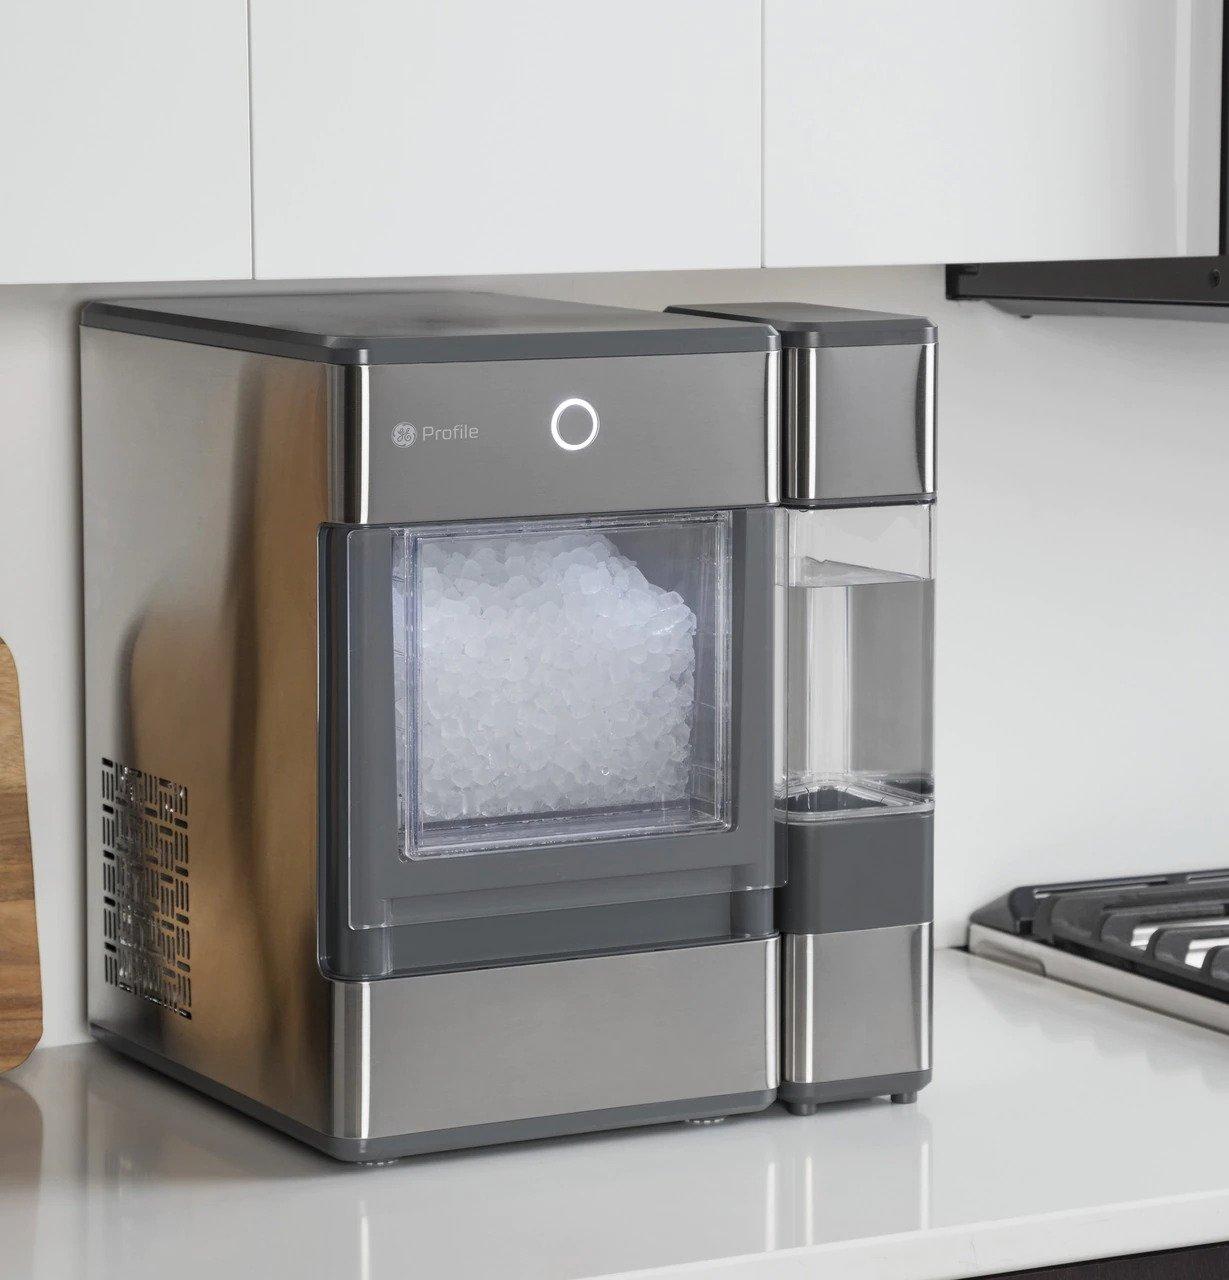 GE Profile Opal Ice Maker Placed in Shelf